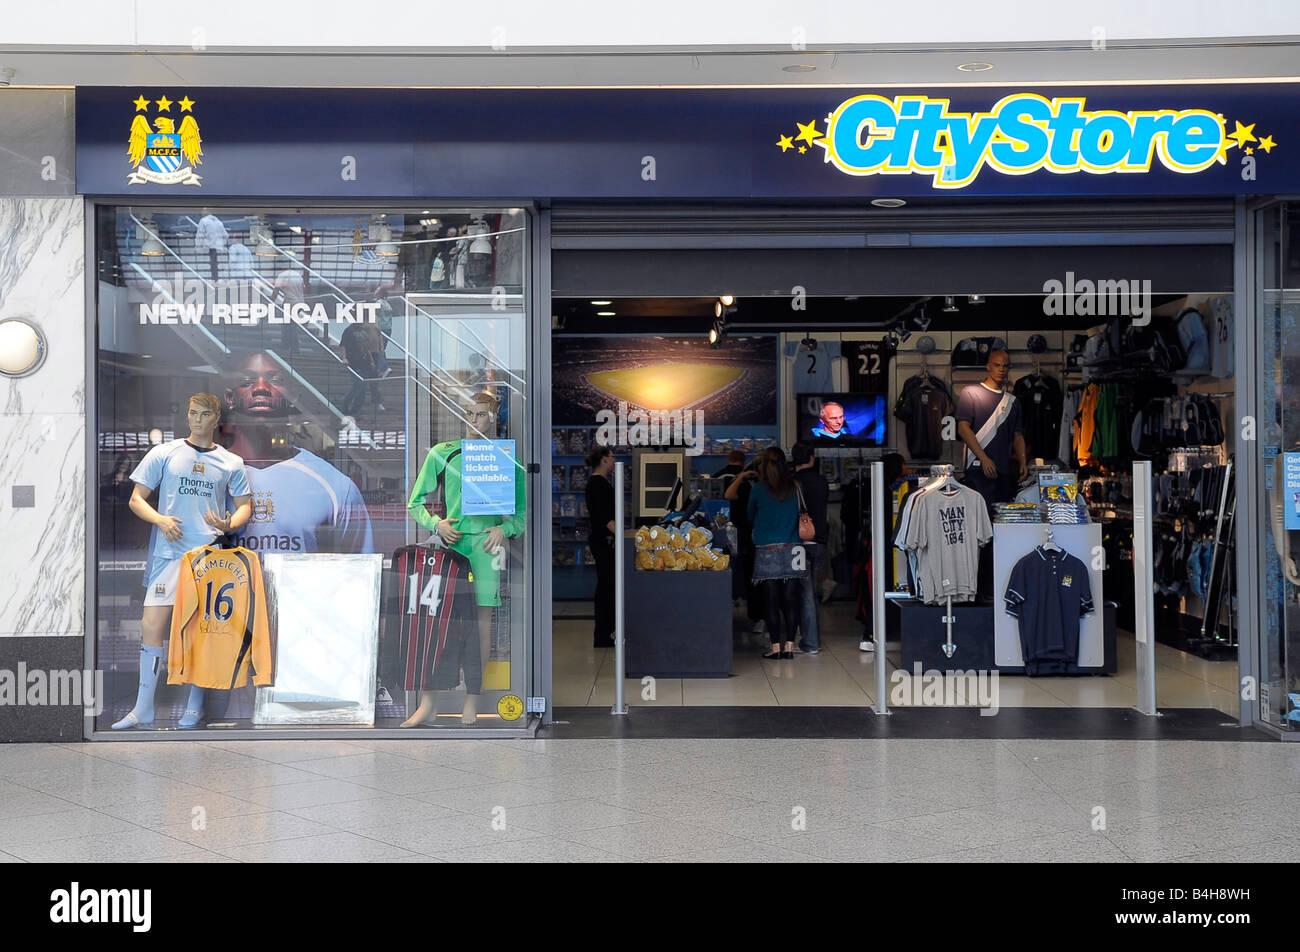 1dcf1b3423121 manchester city store football club badge merchandise logo brand arndale  centre inside interior sport advert halle square